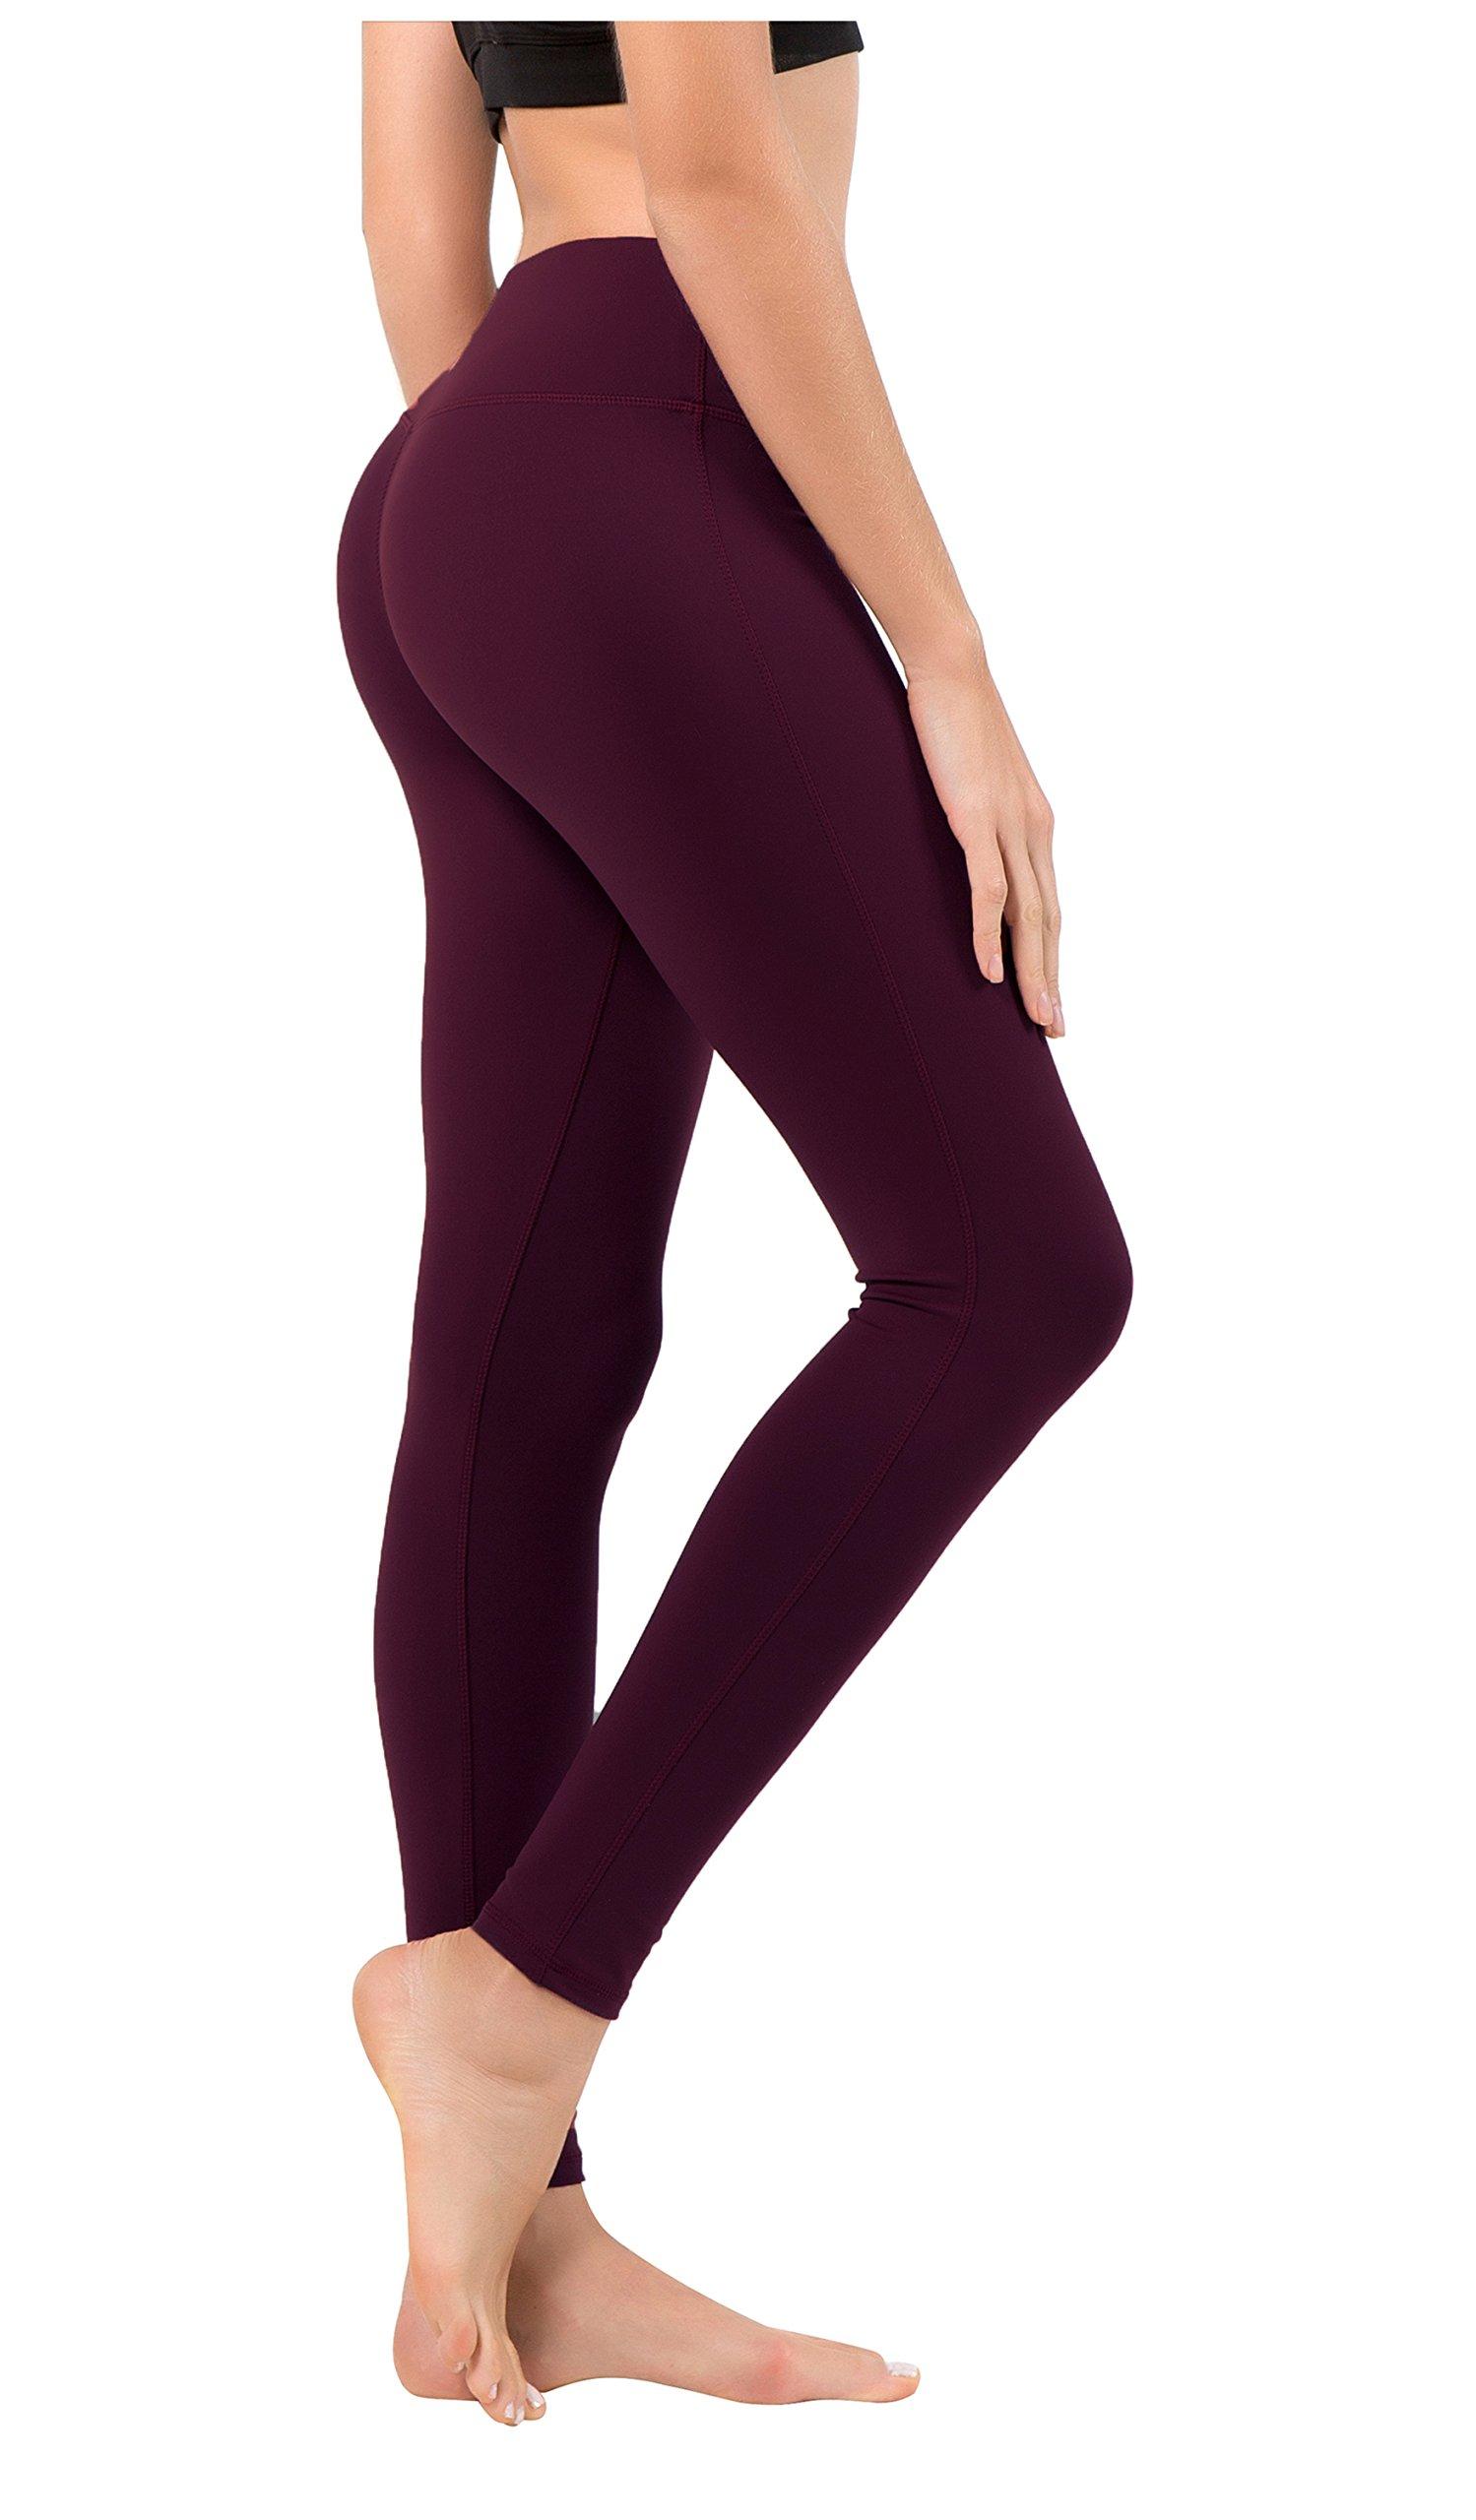 Queenie Ke Women Mid-Waist Phone Back Pockets Sport Legging Yoga Pants Running Tights Size XS Color Dark Rose Red